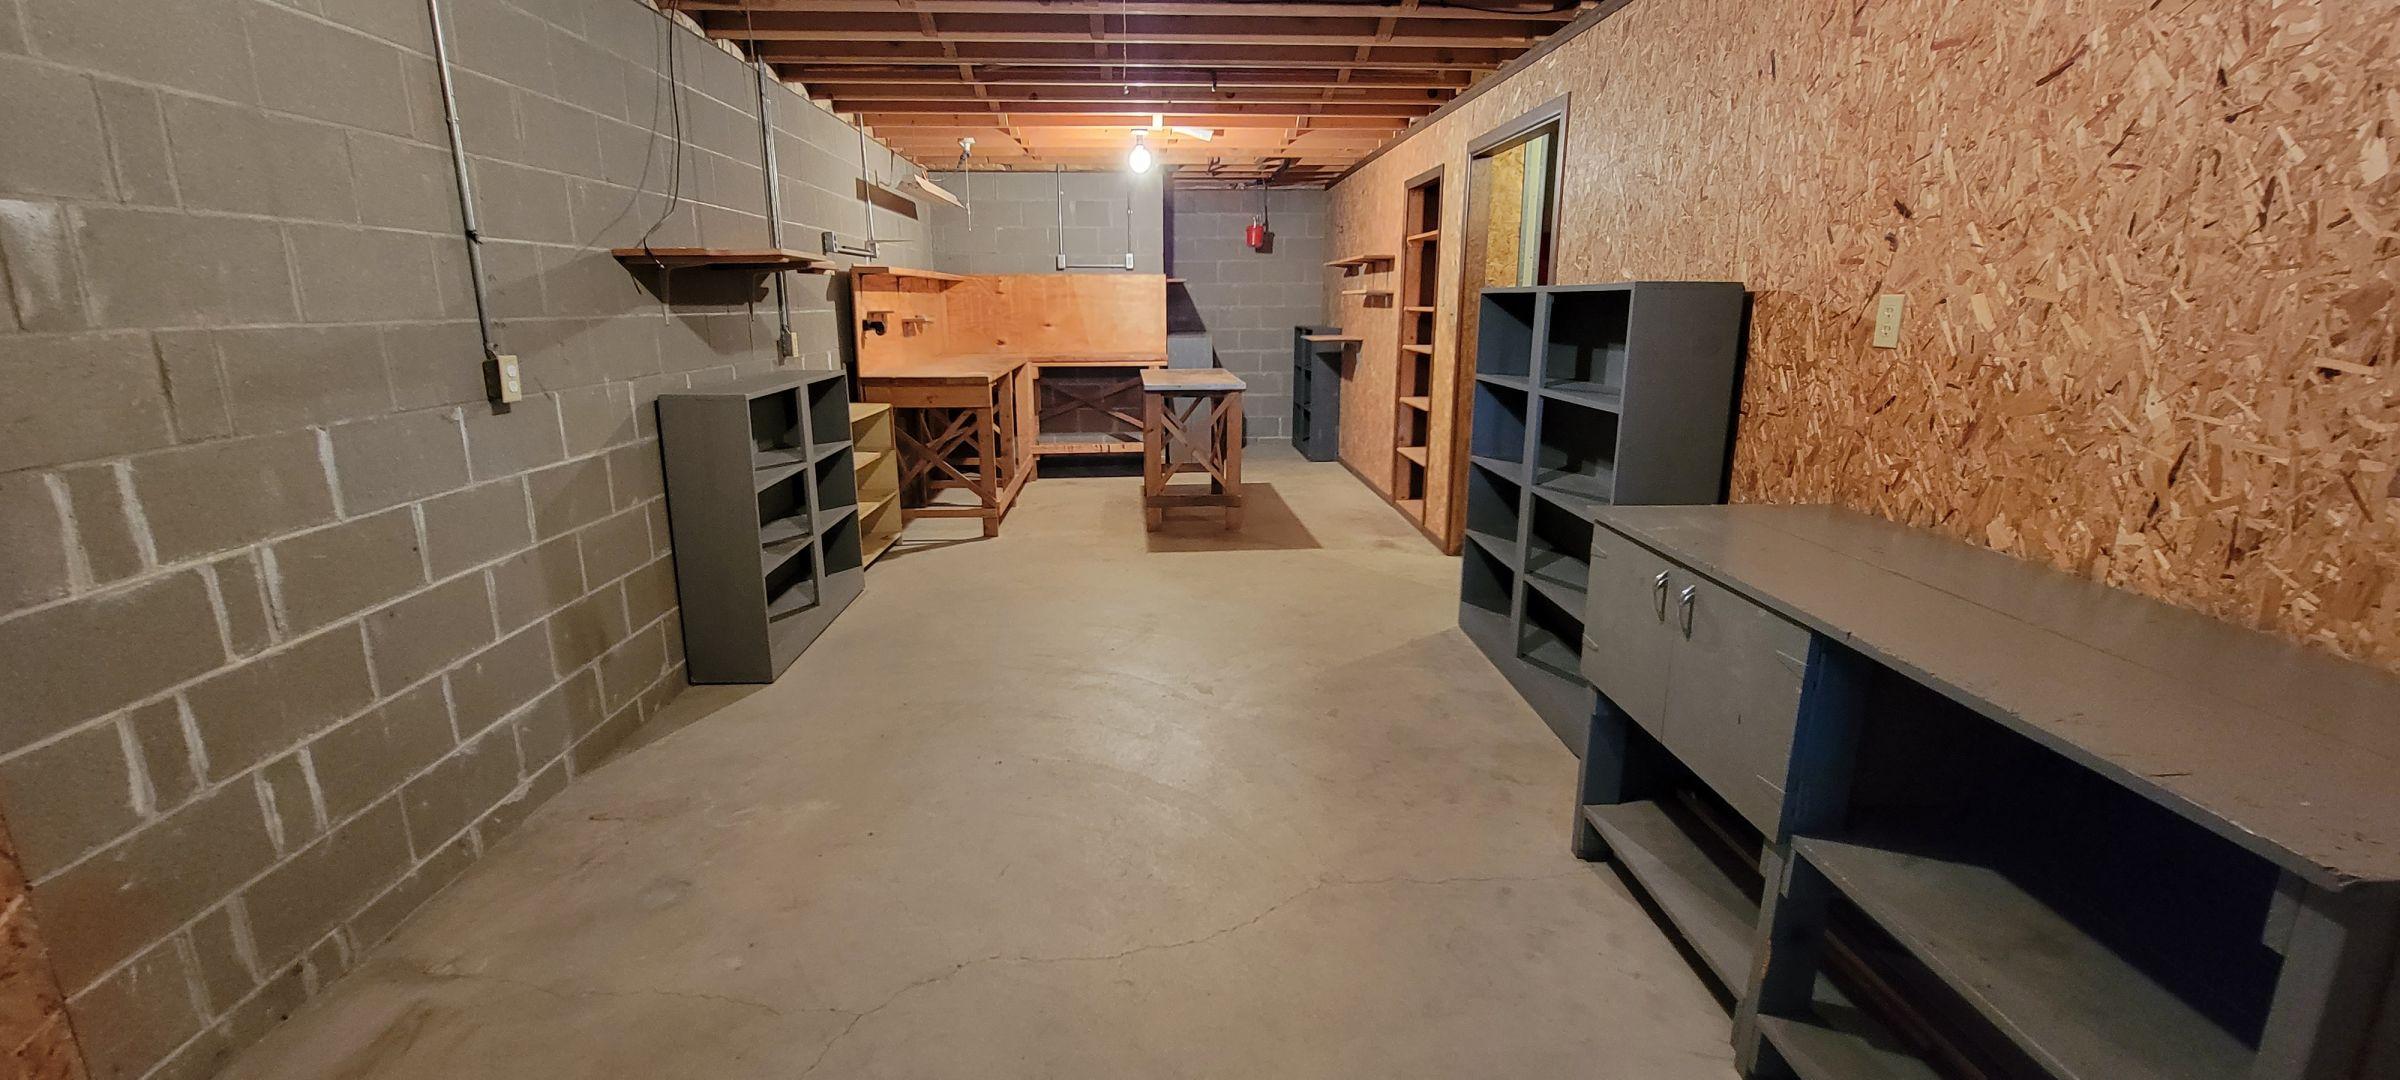 basement workshop and storage